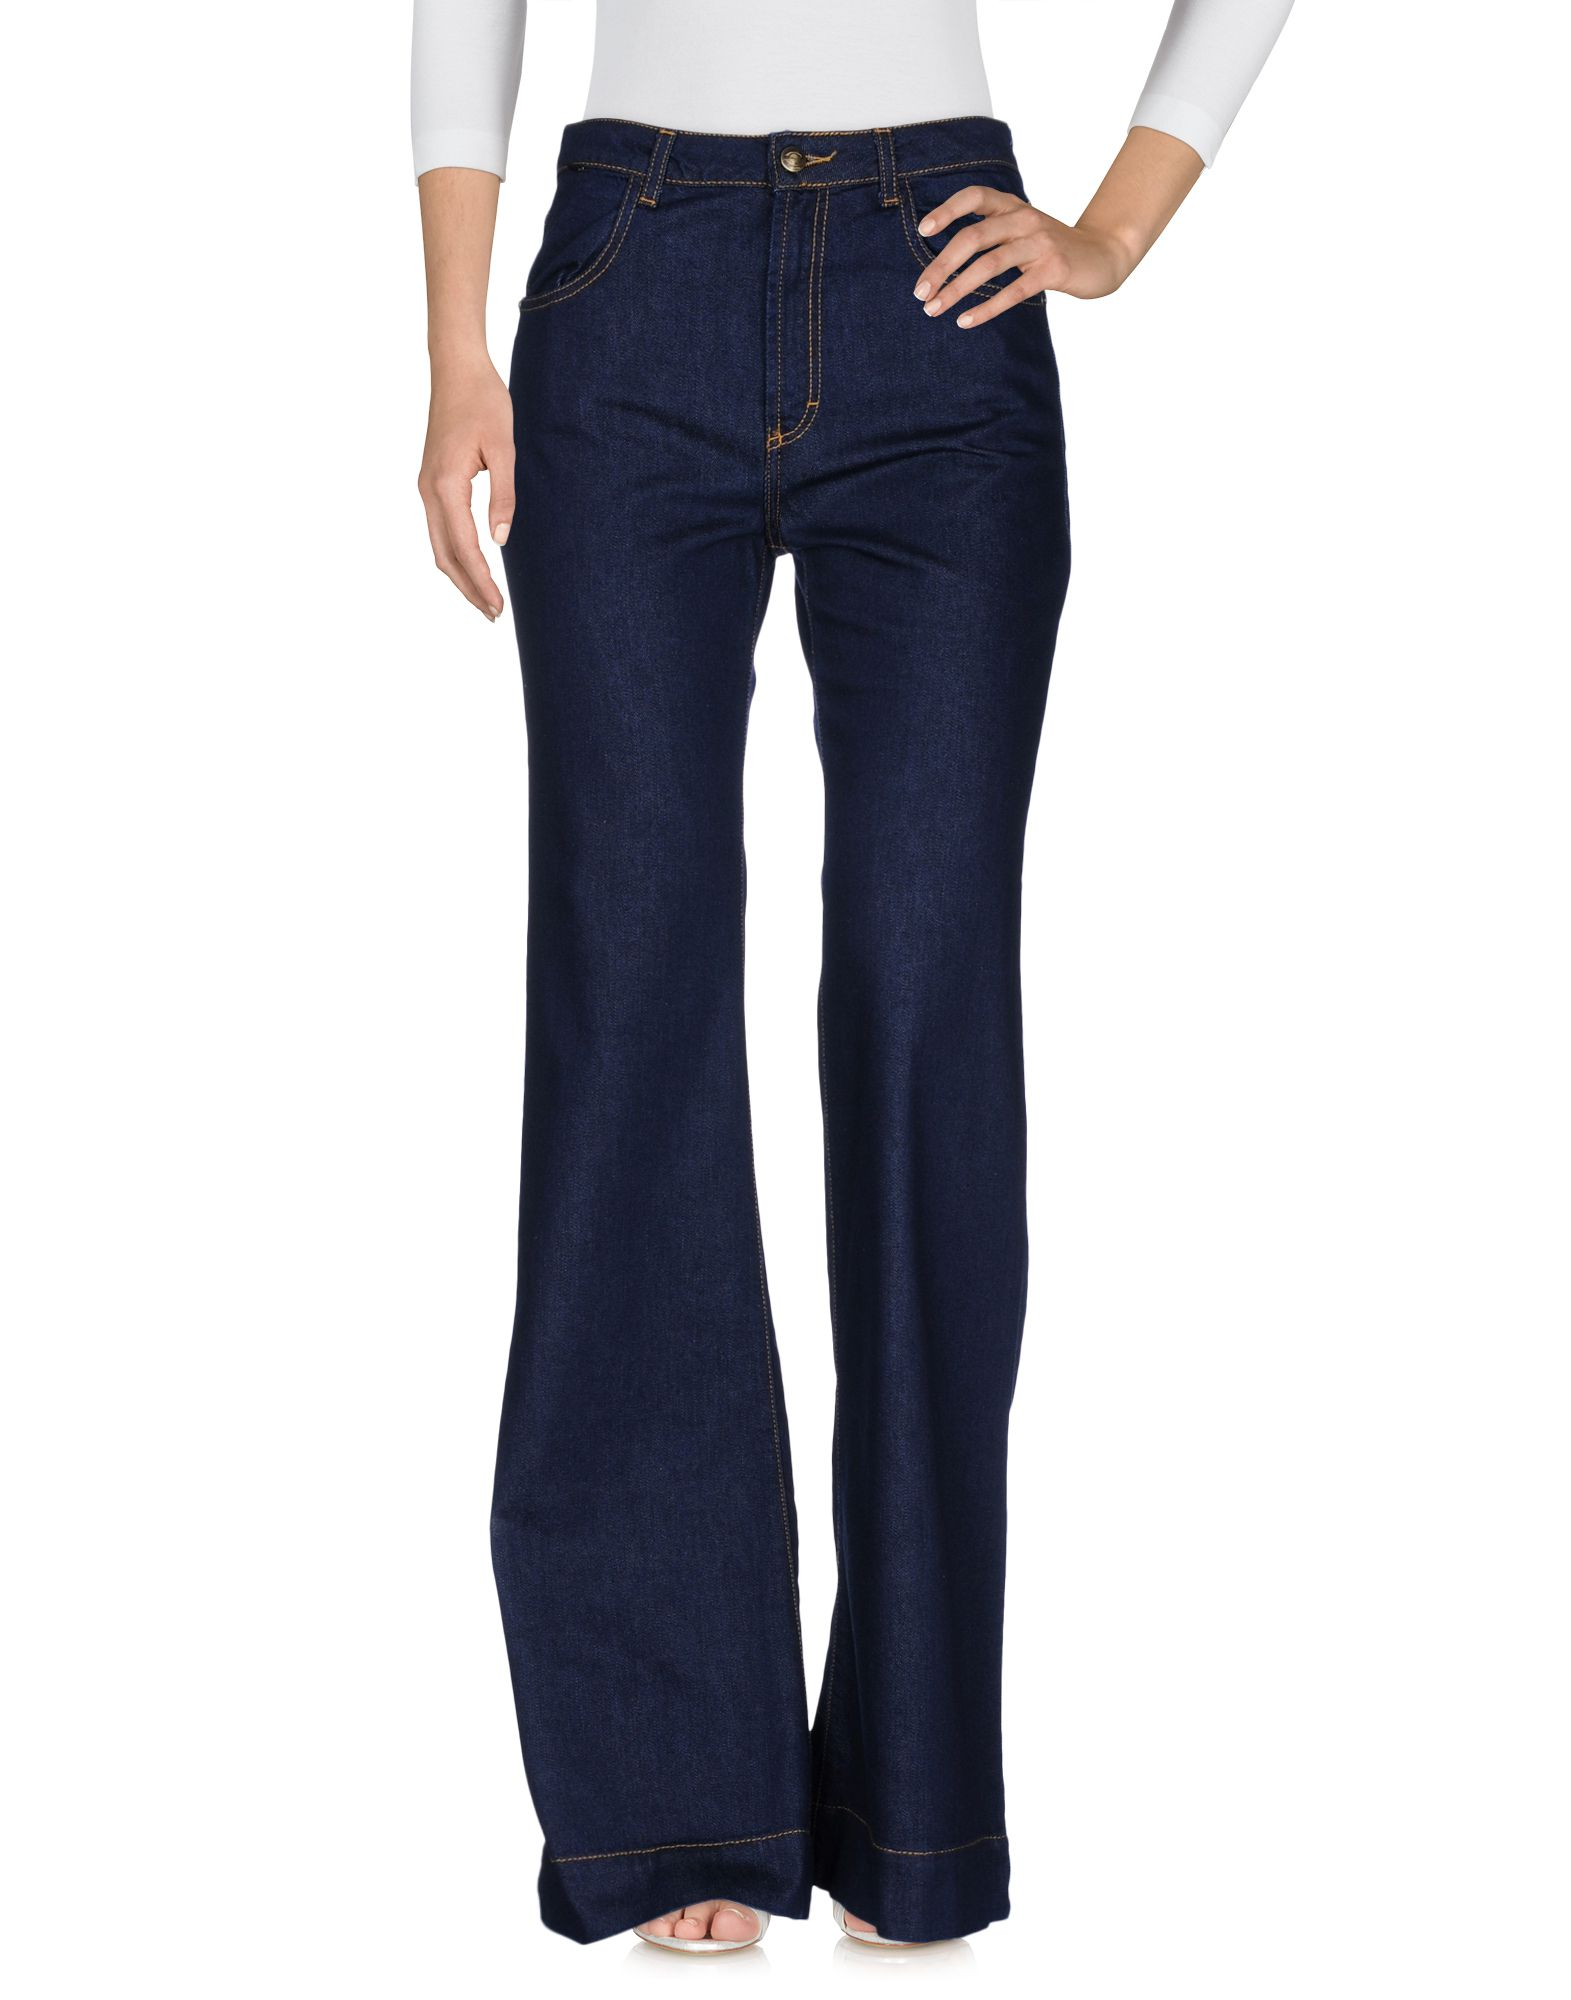 Pantaloni Jeans Just Cavalli Donna - Acquista online su h1Nxns2z